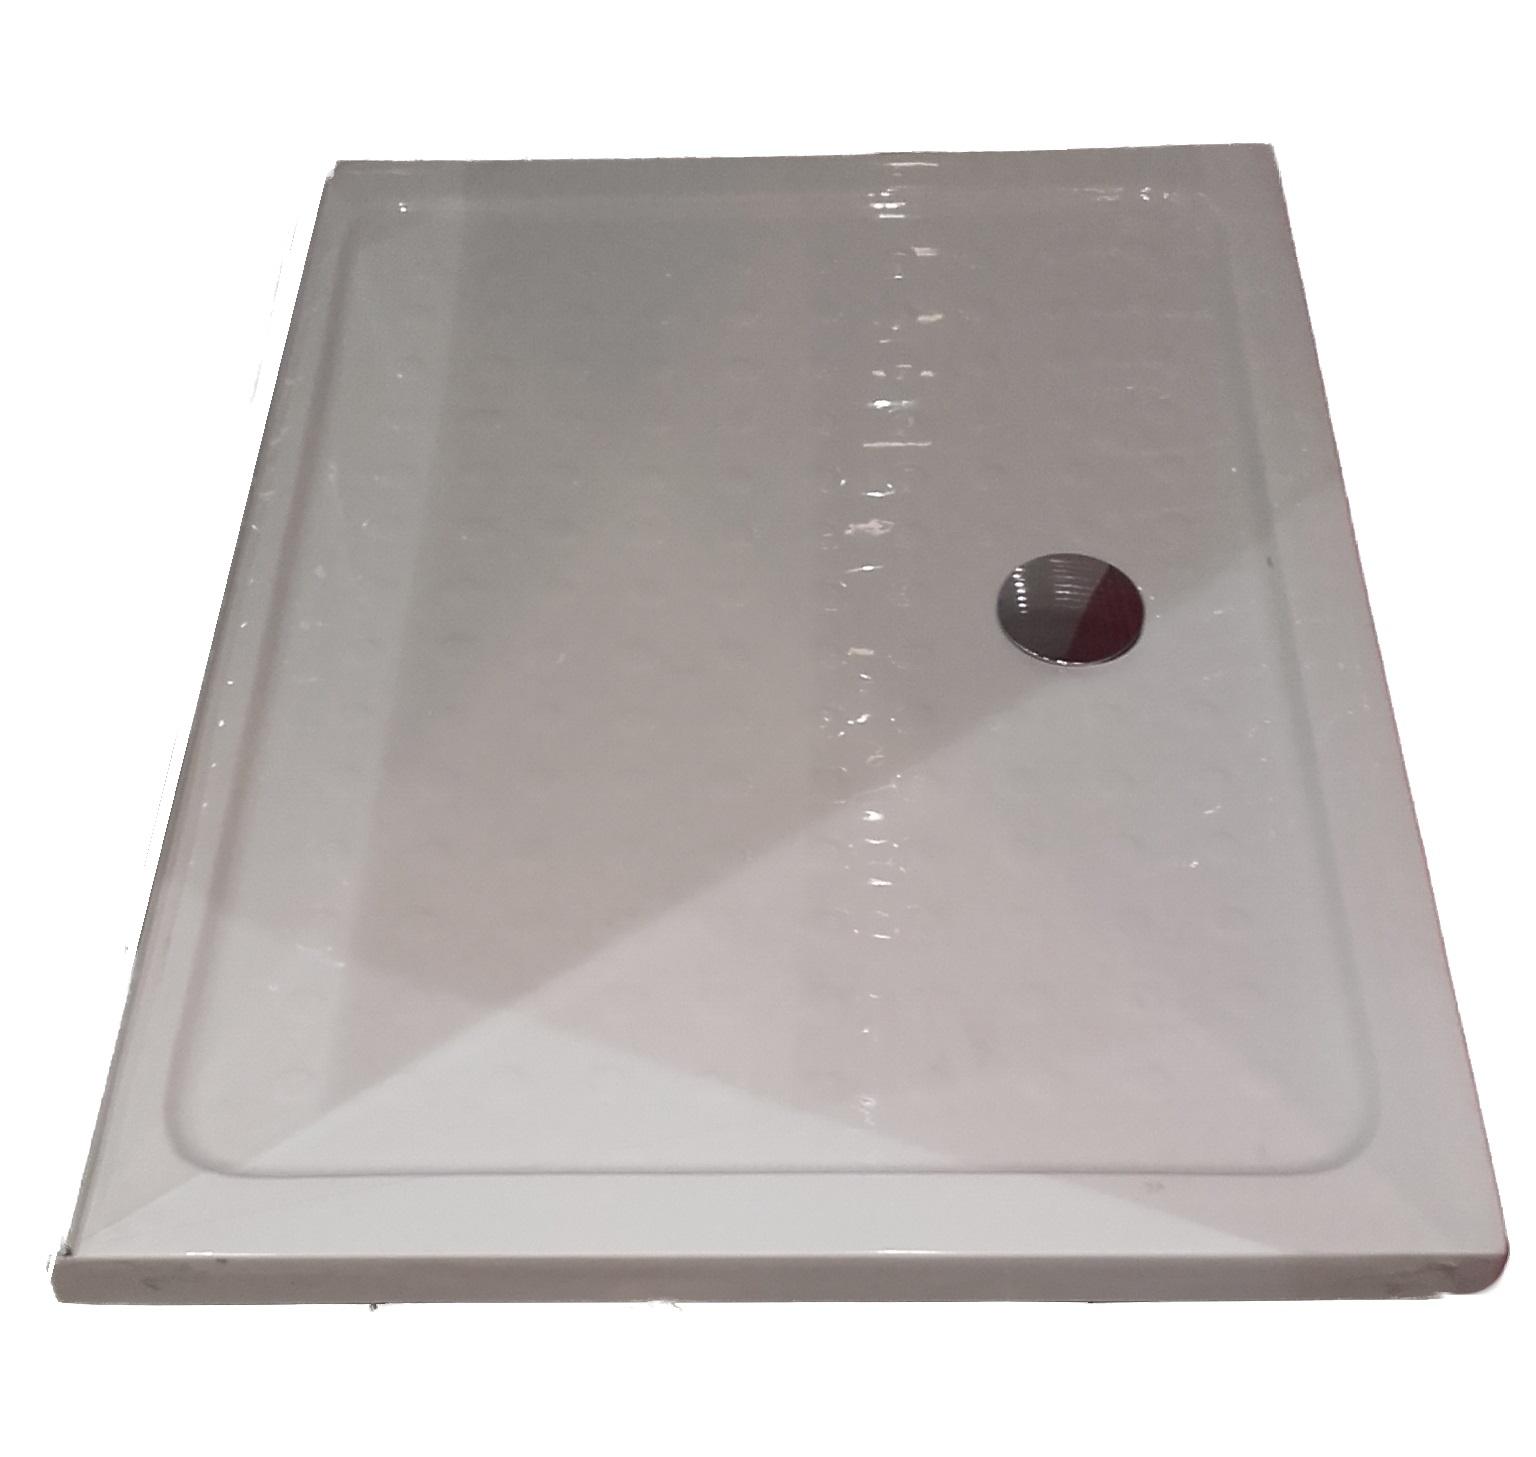 Flat Shower Tray 90x120x5 cm